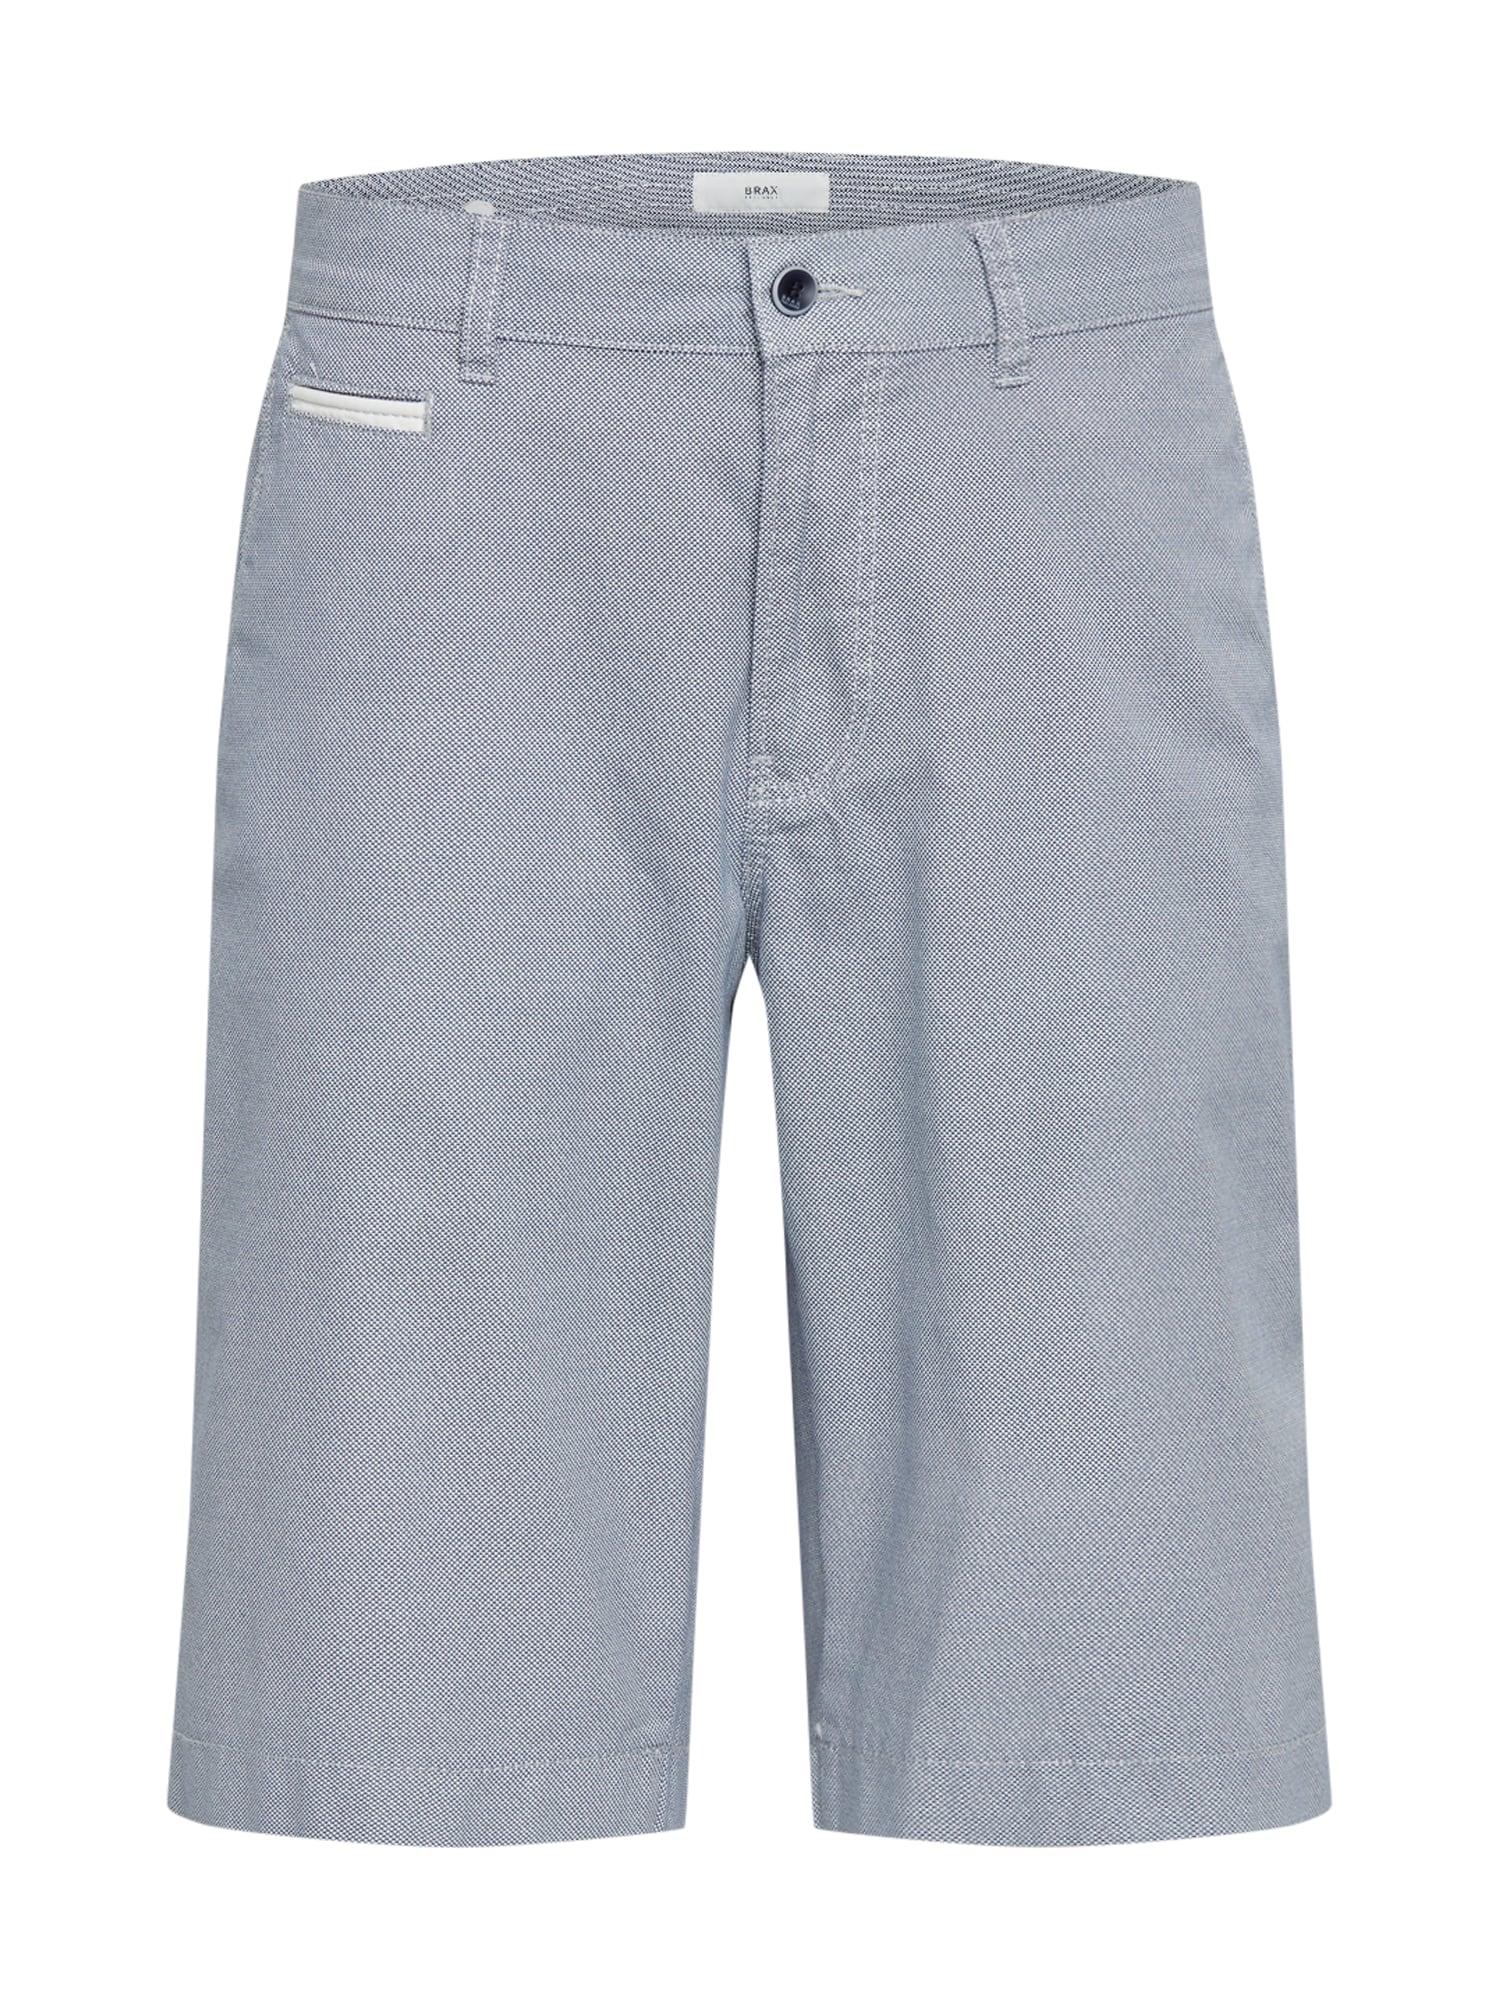 BRAX Chino stiliaus kelnės 'Bari C' balta / melsvai pilka